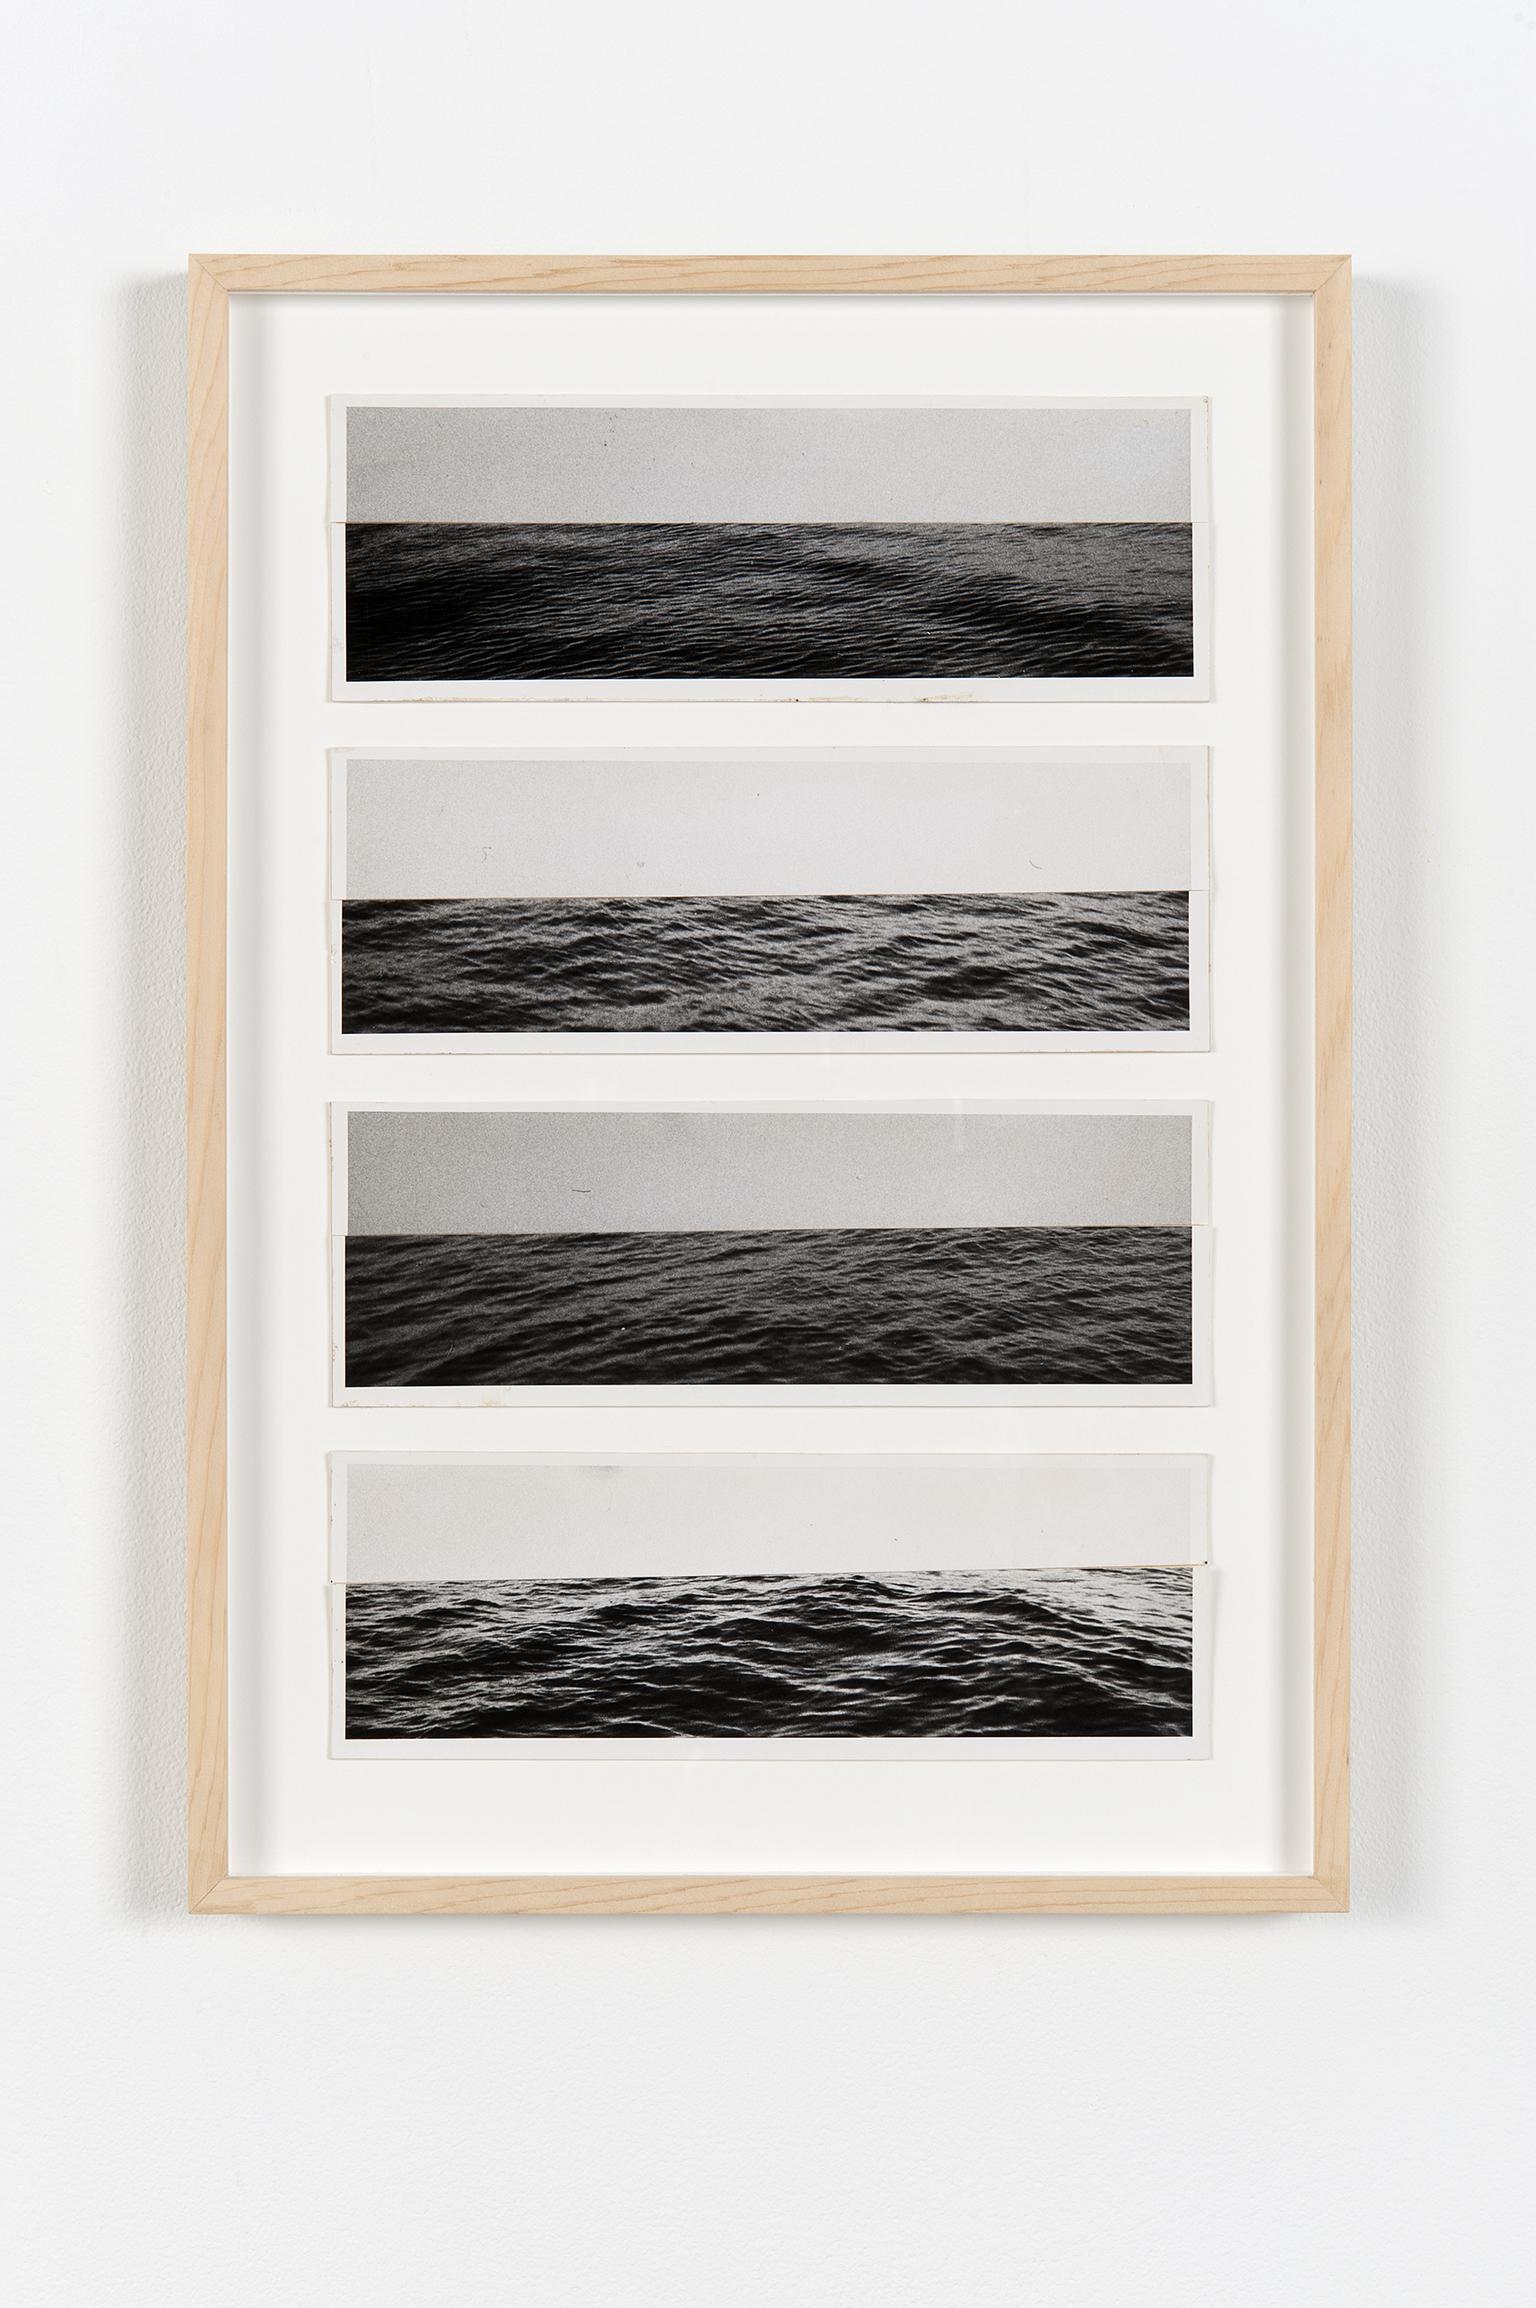 Robert Kleyn, Horizons, 1974–1975, hand-printed photographs on cardstock, 19 x 14 in. (48 x 34 cm) by